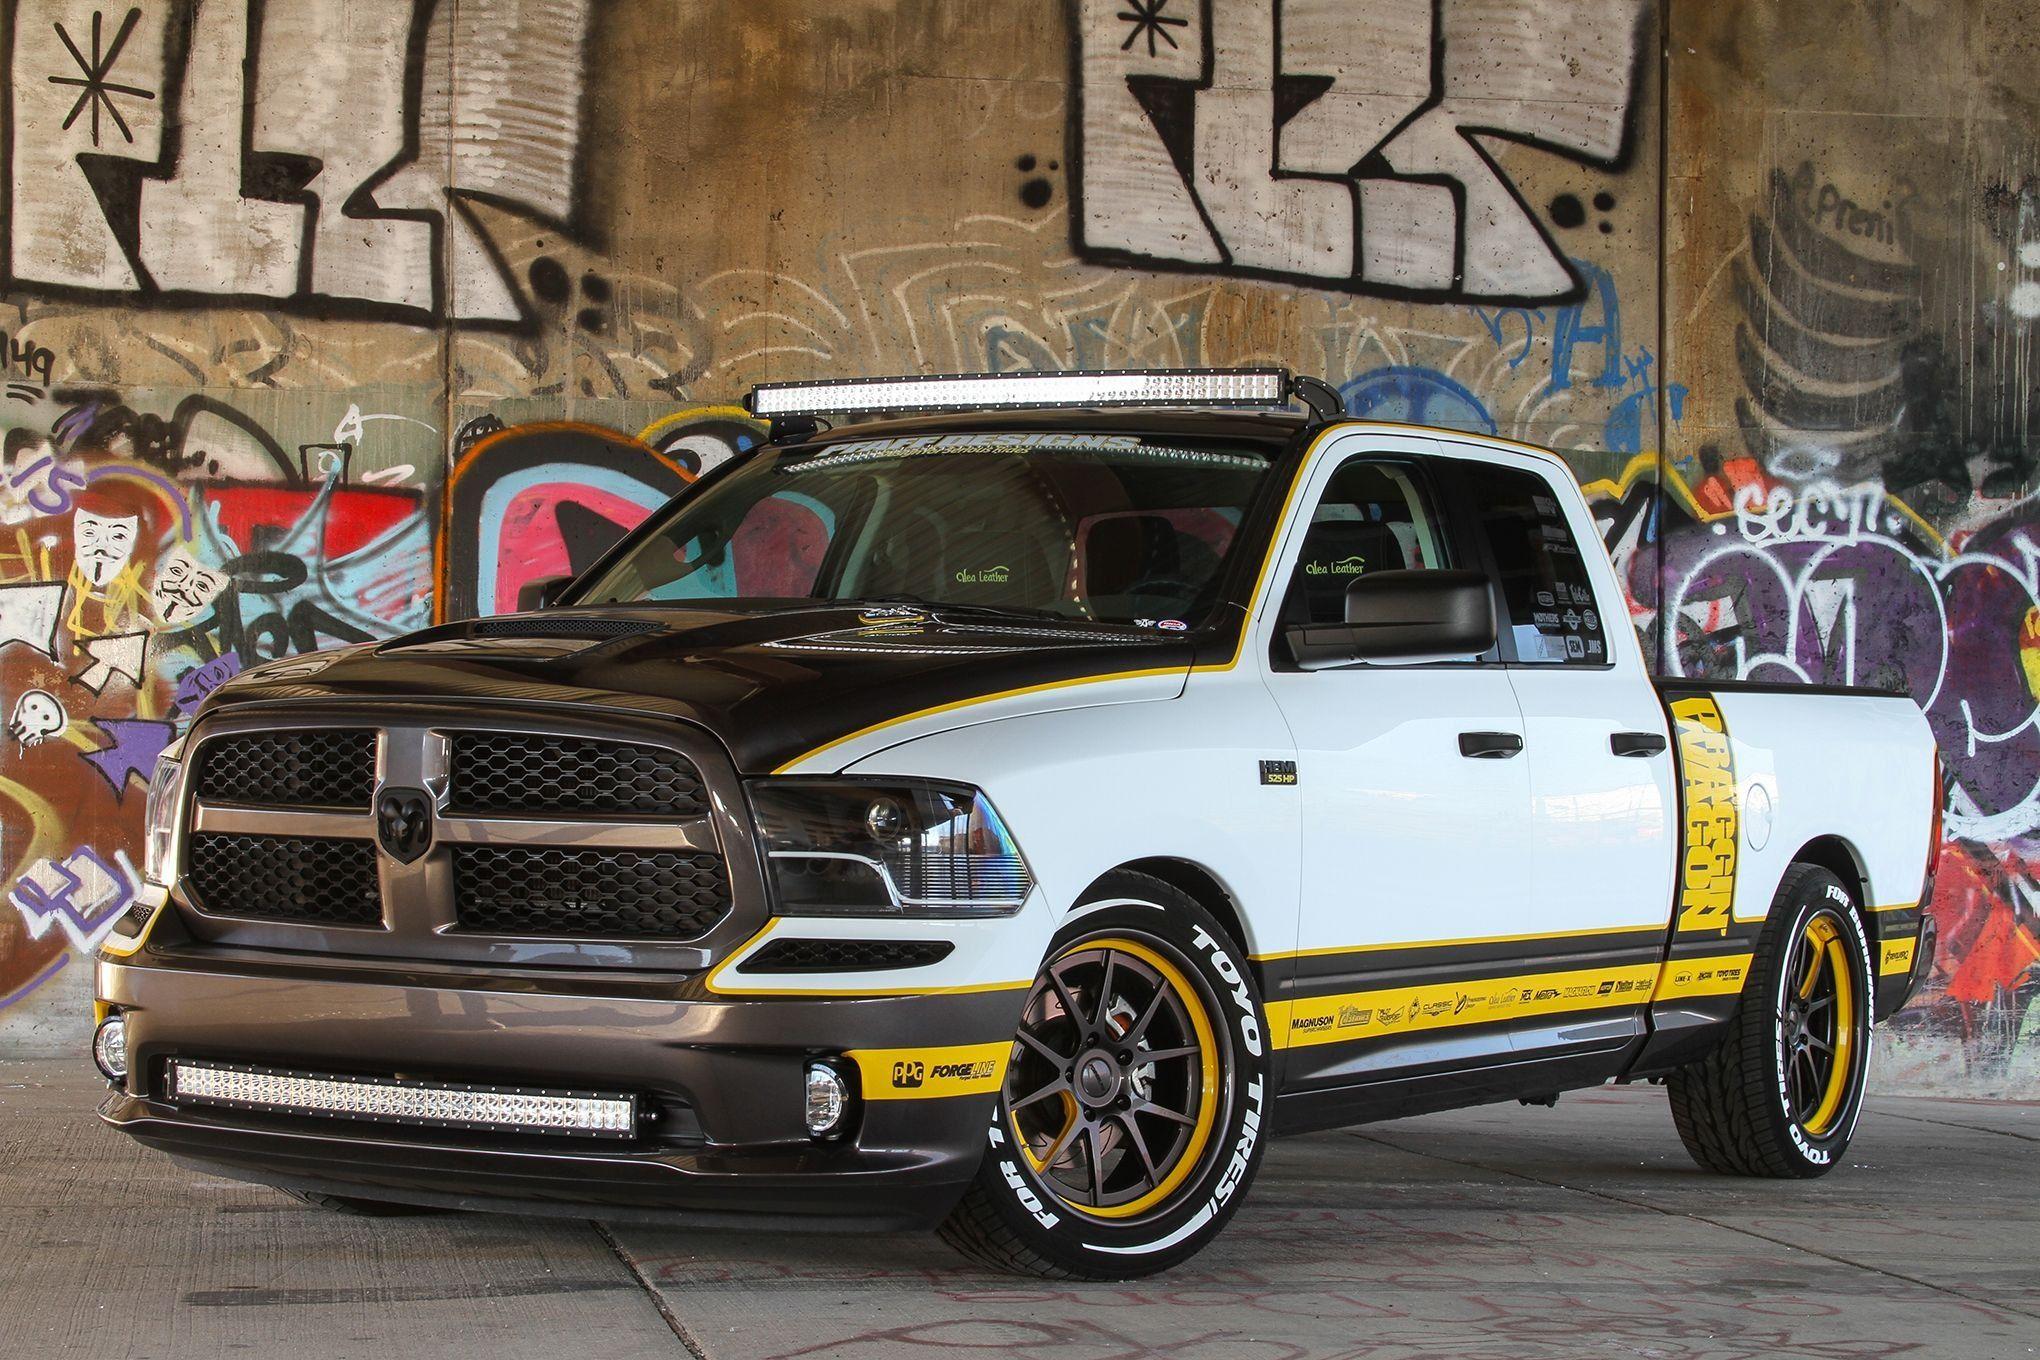 White Dodge Ram Spruced Up With Led Light Bars Old Dodge Trucks Dodge Trucks Dodge Ram